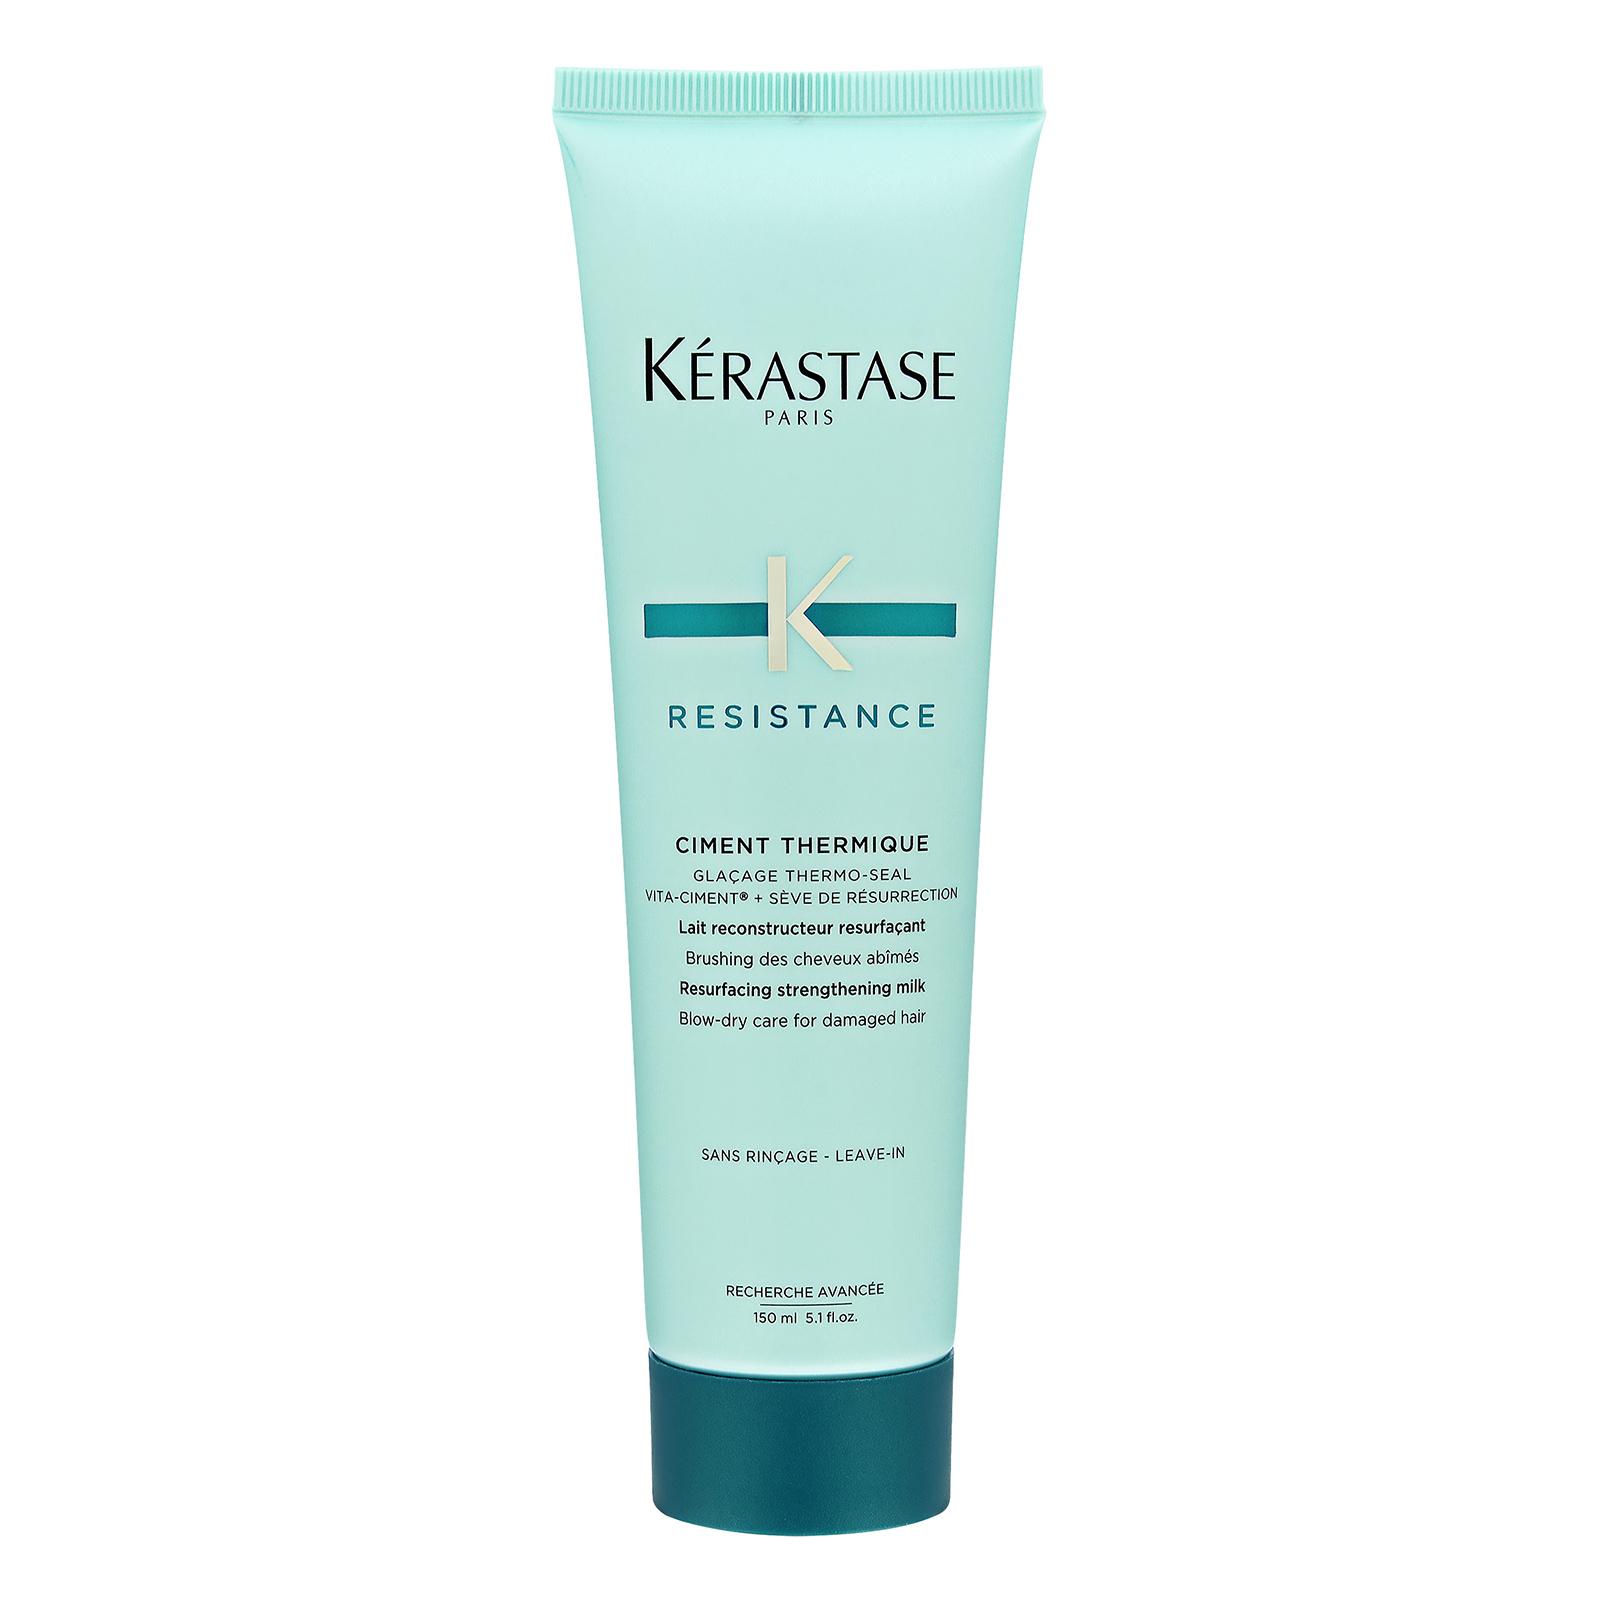 Kérastase Paris Resistance Ciment Thermique Resurfacing Strengthening Milk Blow-Dry Care (For Damaged Hair)  5.1oz, 150ml